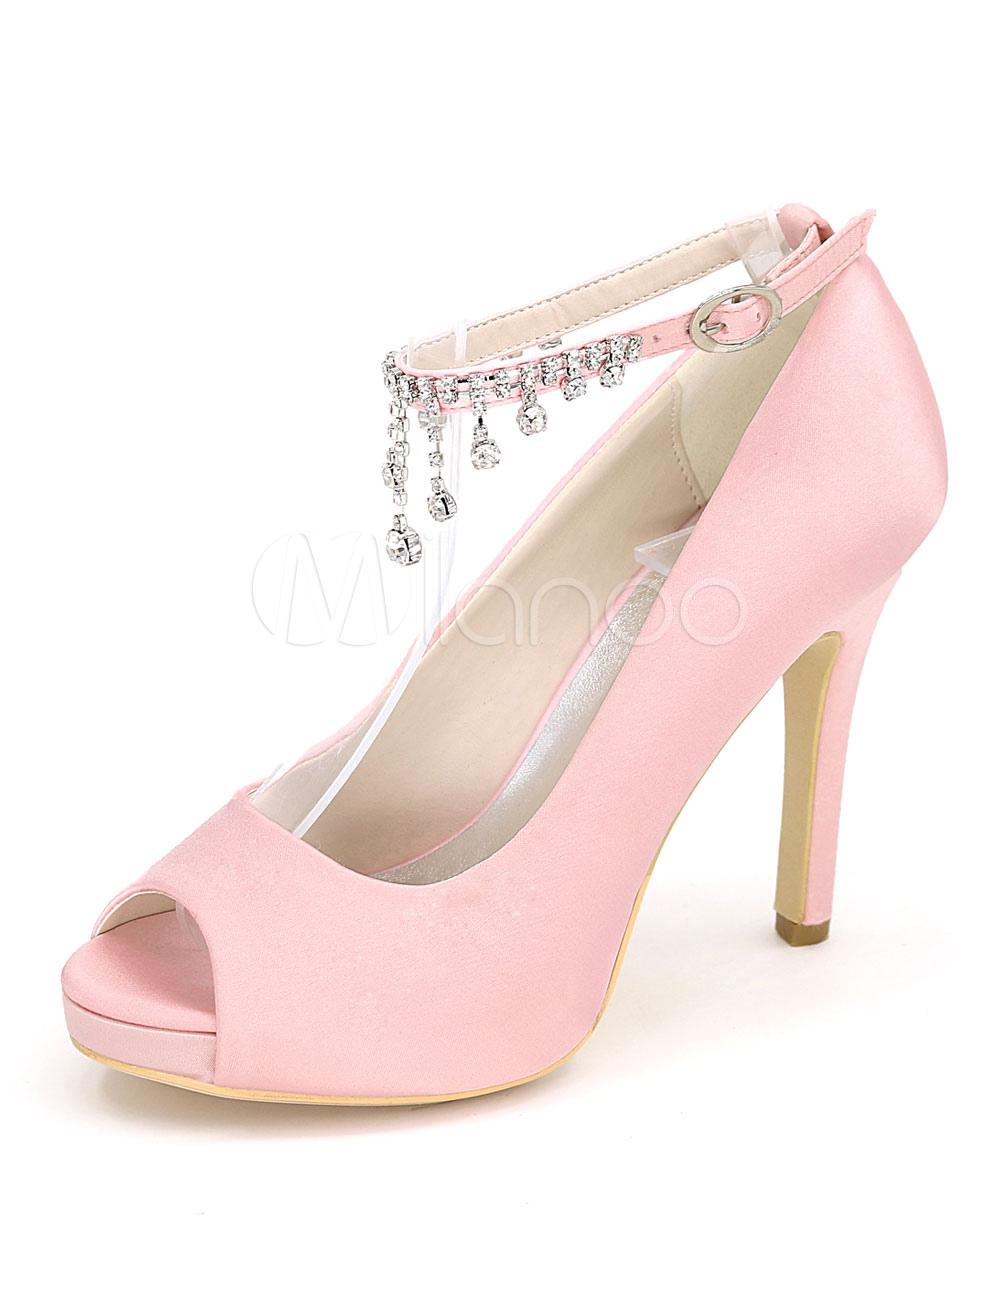 946b6c5347d0 Pink Wedding Shoes Women High Heels Satin Peep Toe Rhinestones Ankle ...